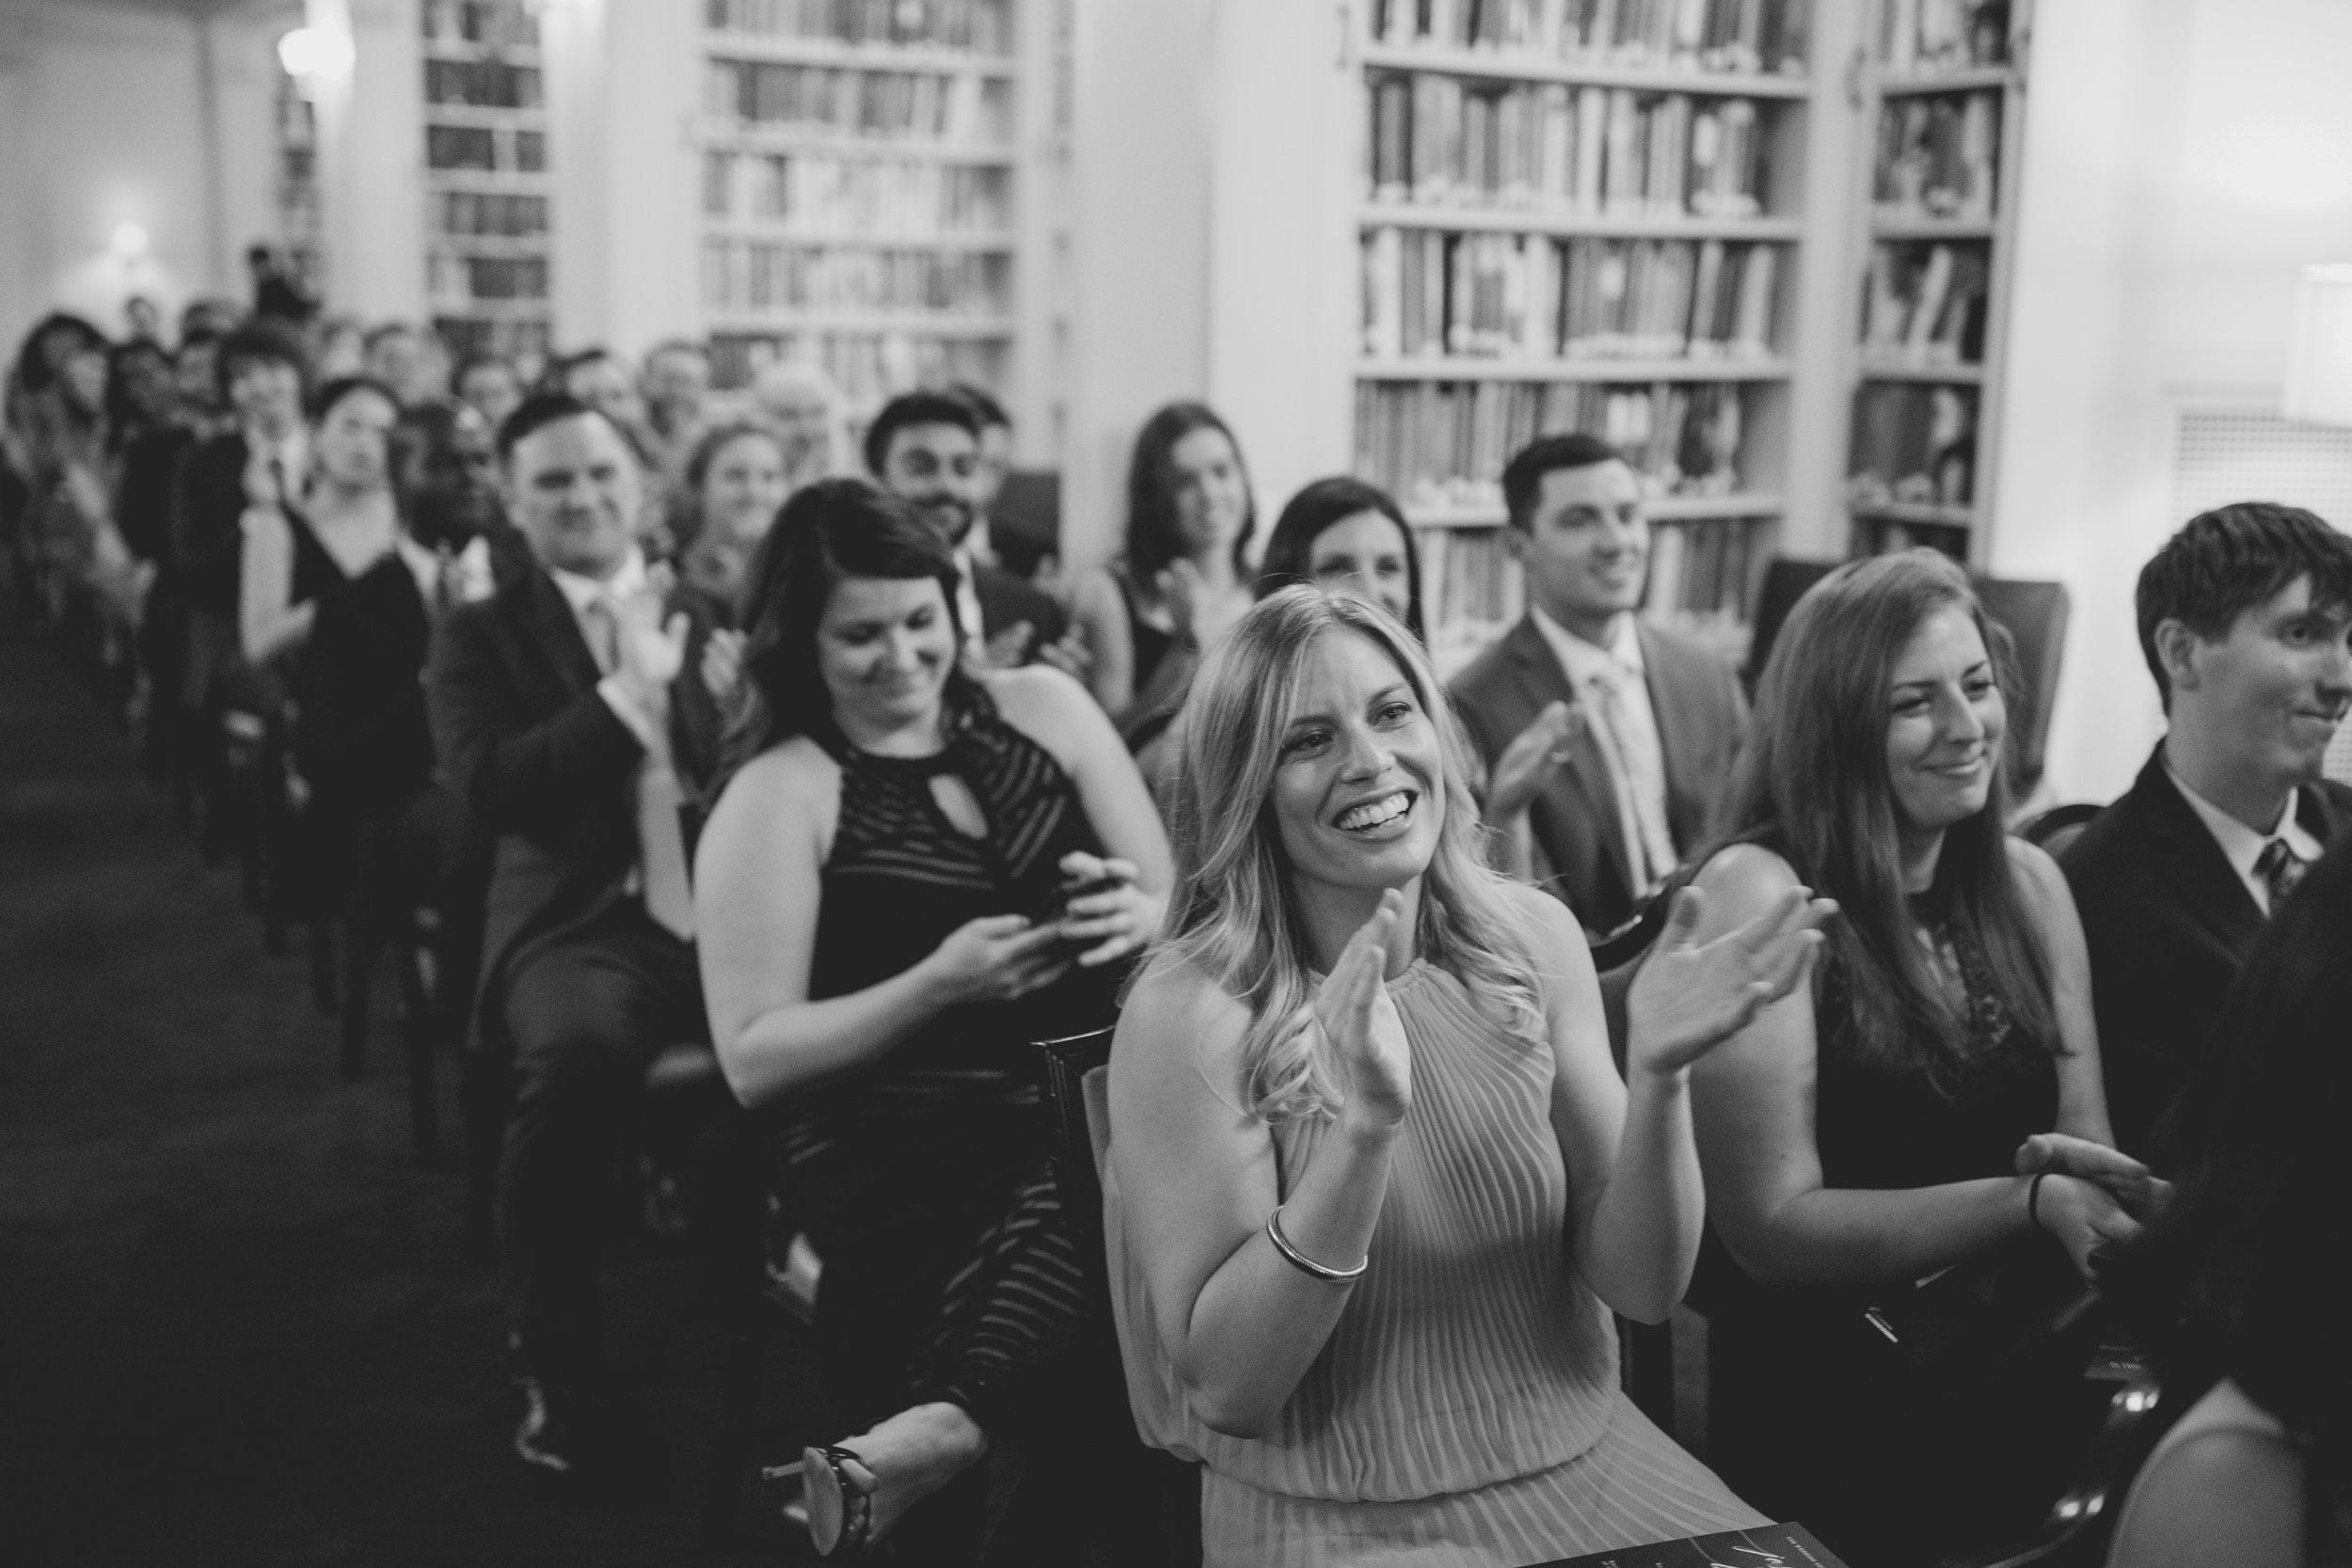 amanda_vanvels_new_york_lgbtq_gay_wedding_066.jpg